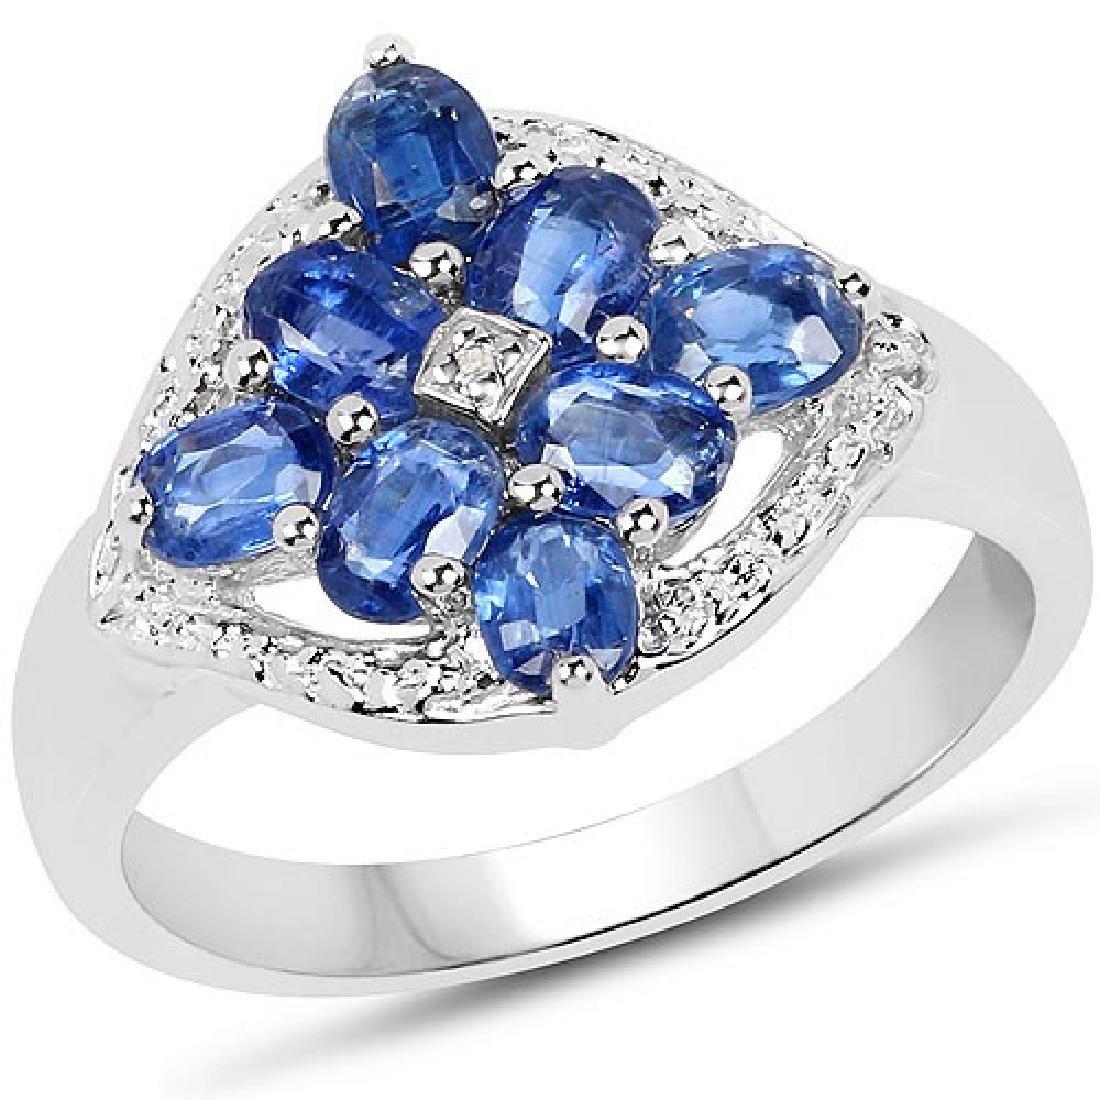 2.17 Carat Genuine Kyanite & White Diamond .925 Sterlin